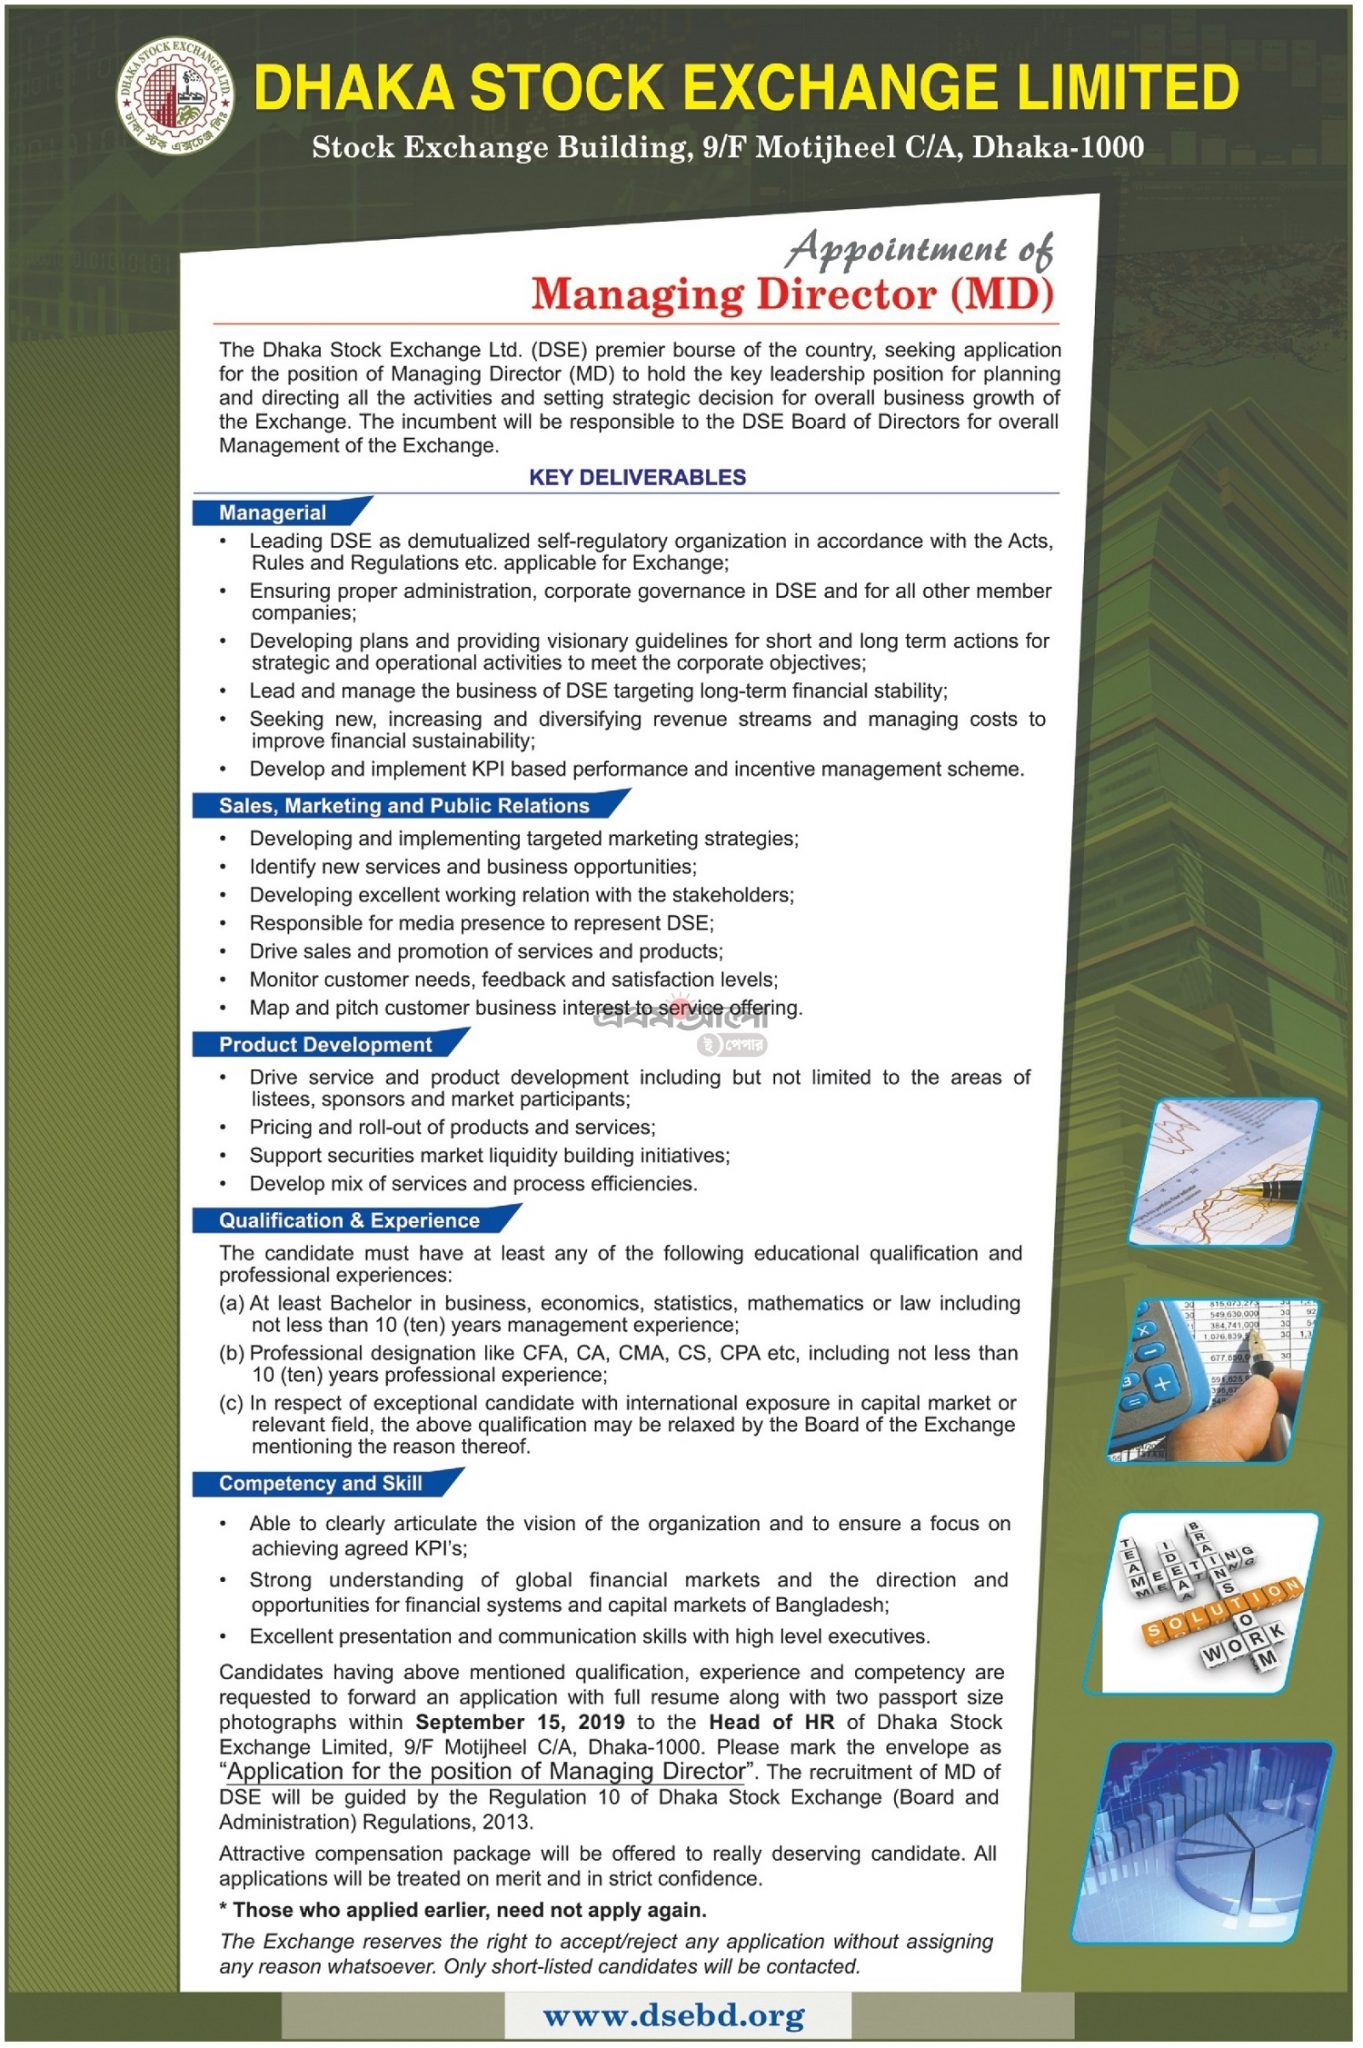 Dhaka Stock Exchange Limited Job Circular 2019